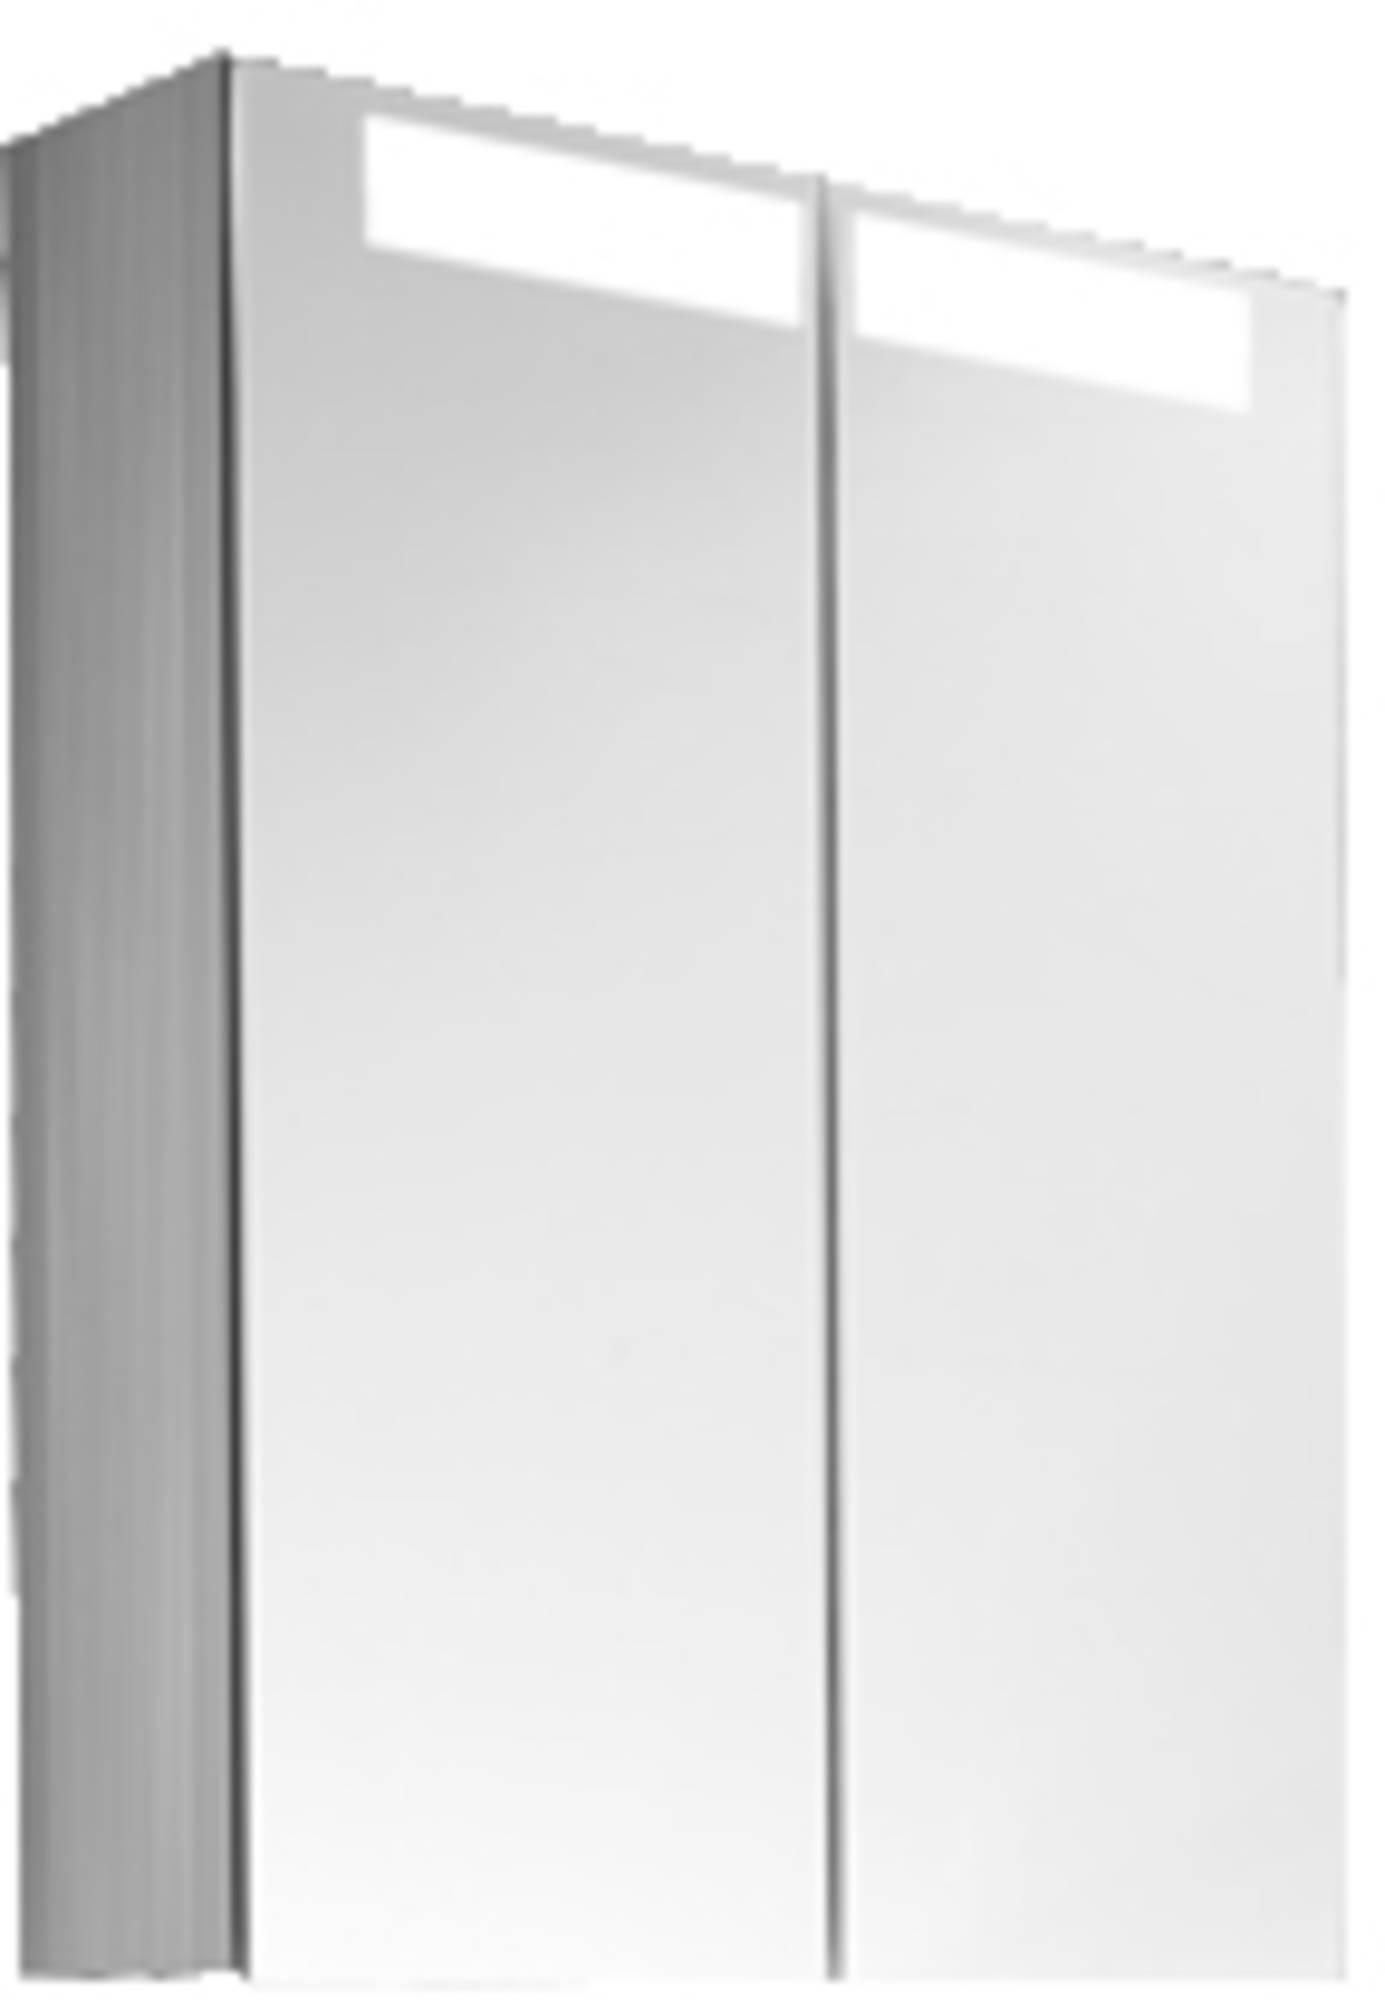 Villeroy & boch Reflection spiegelkast 100 cm,